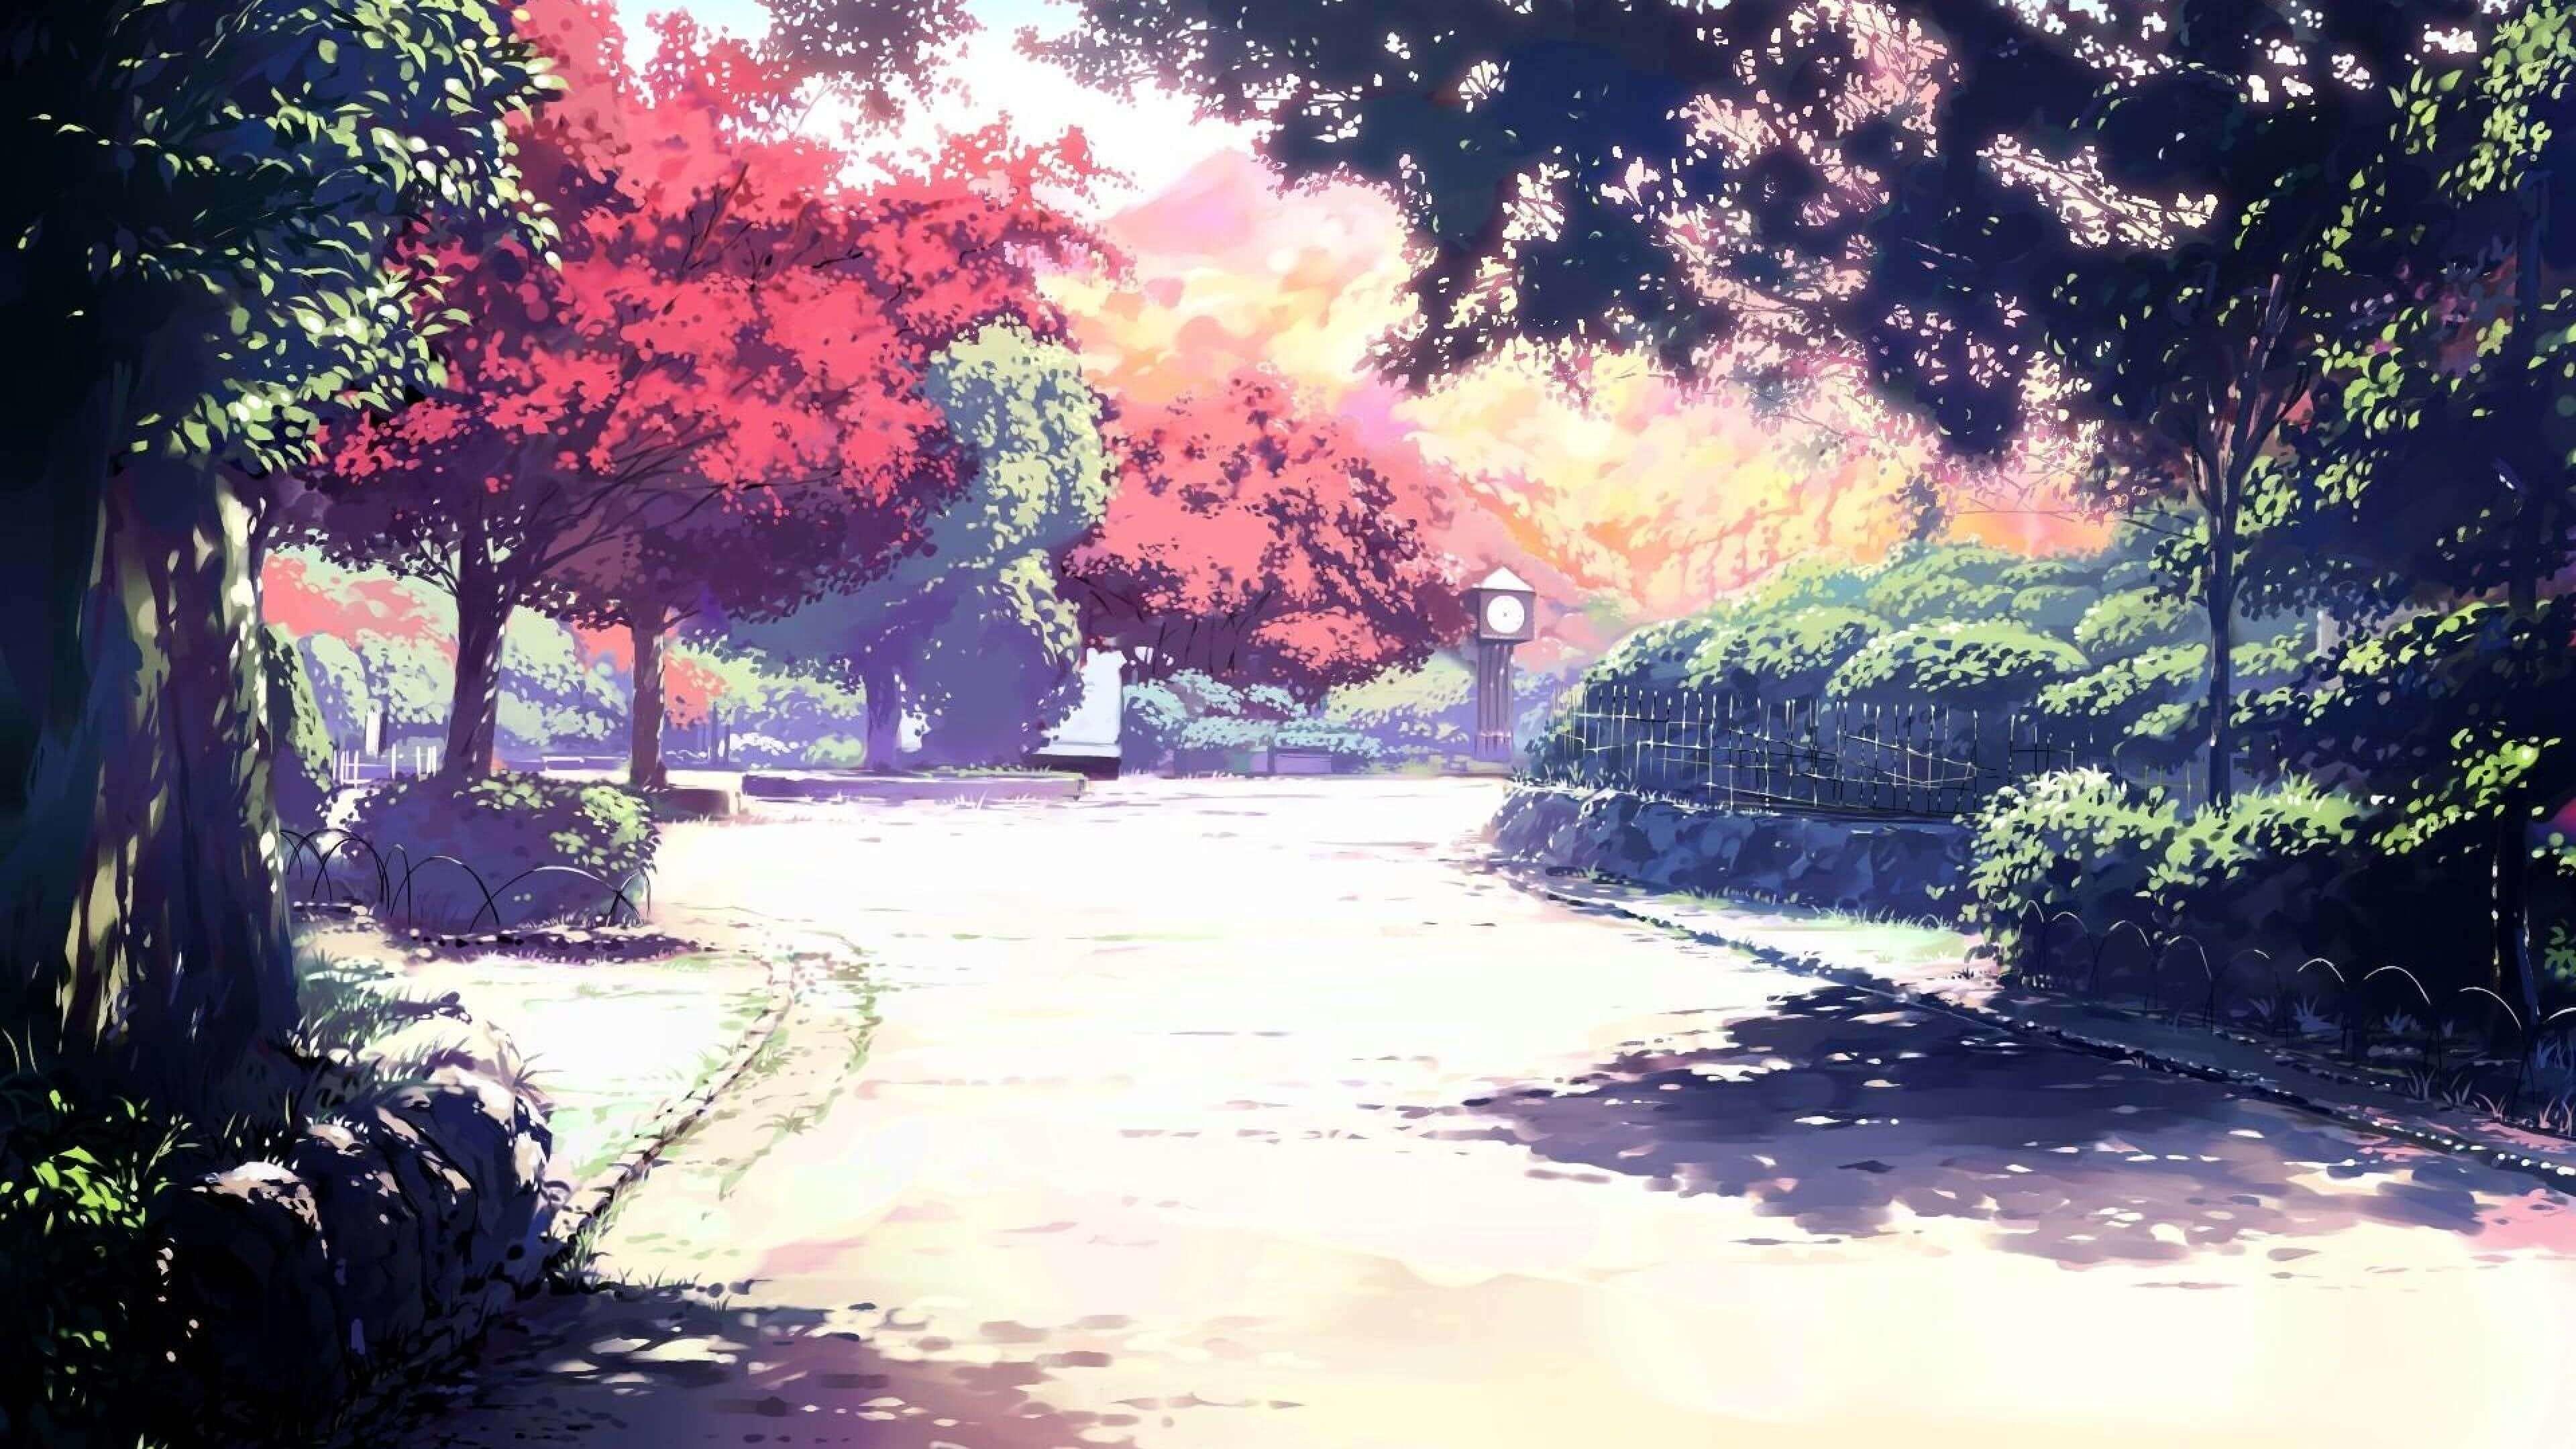 Res: 3840x2160, wallpaper.wiki-Sunlight-Spirited-Away-Anime-4k-HD-